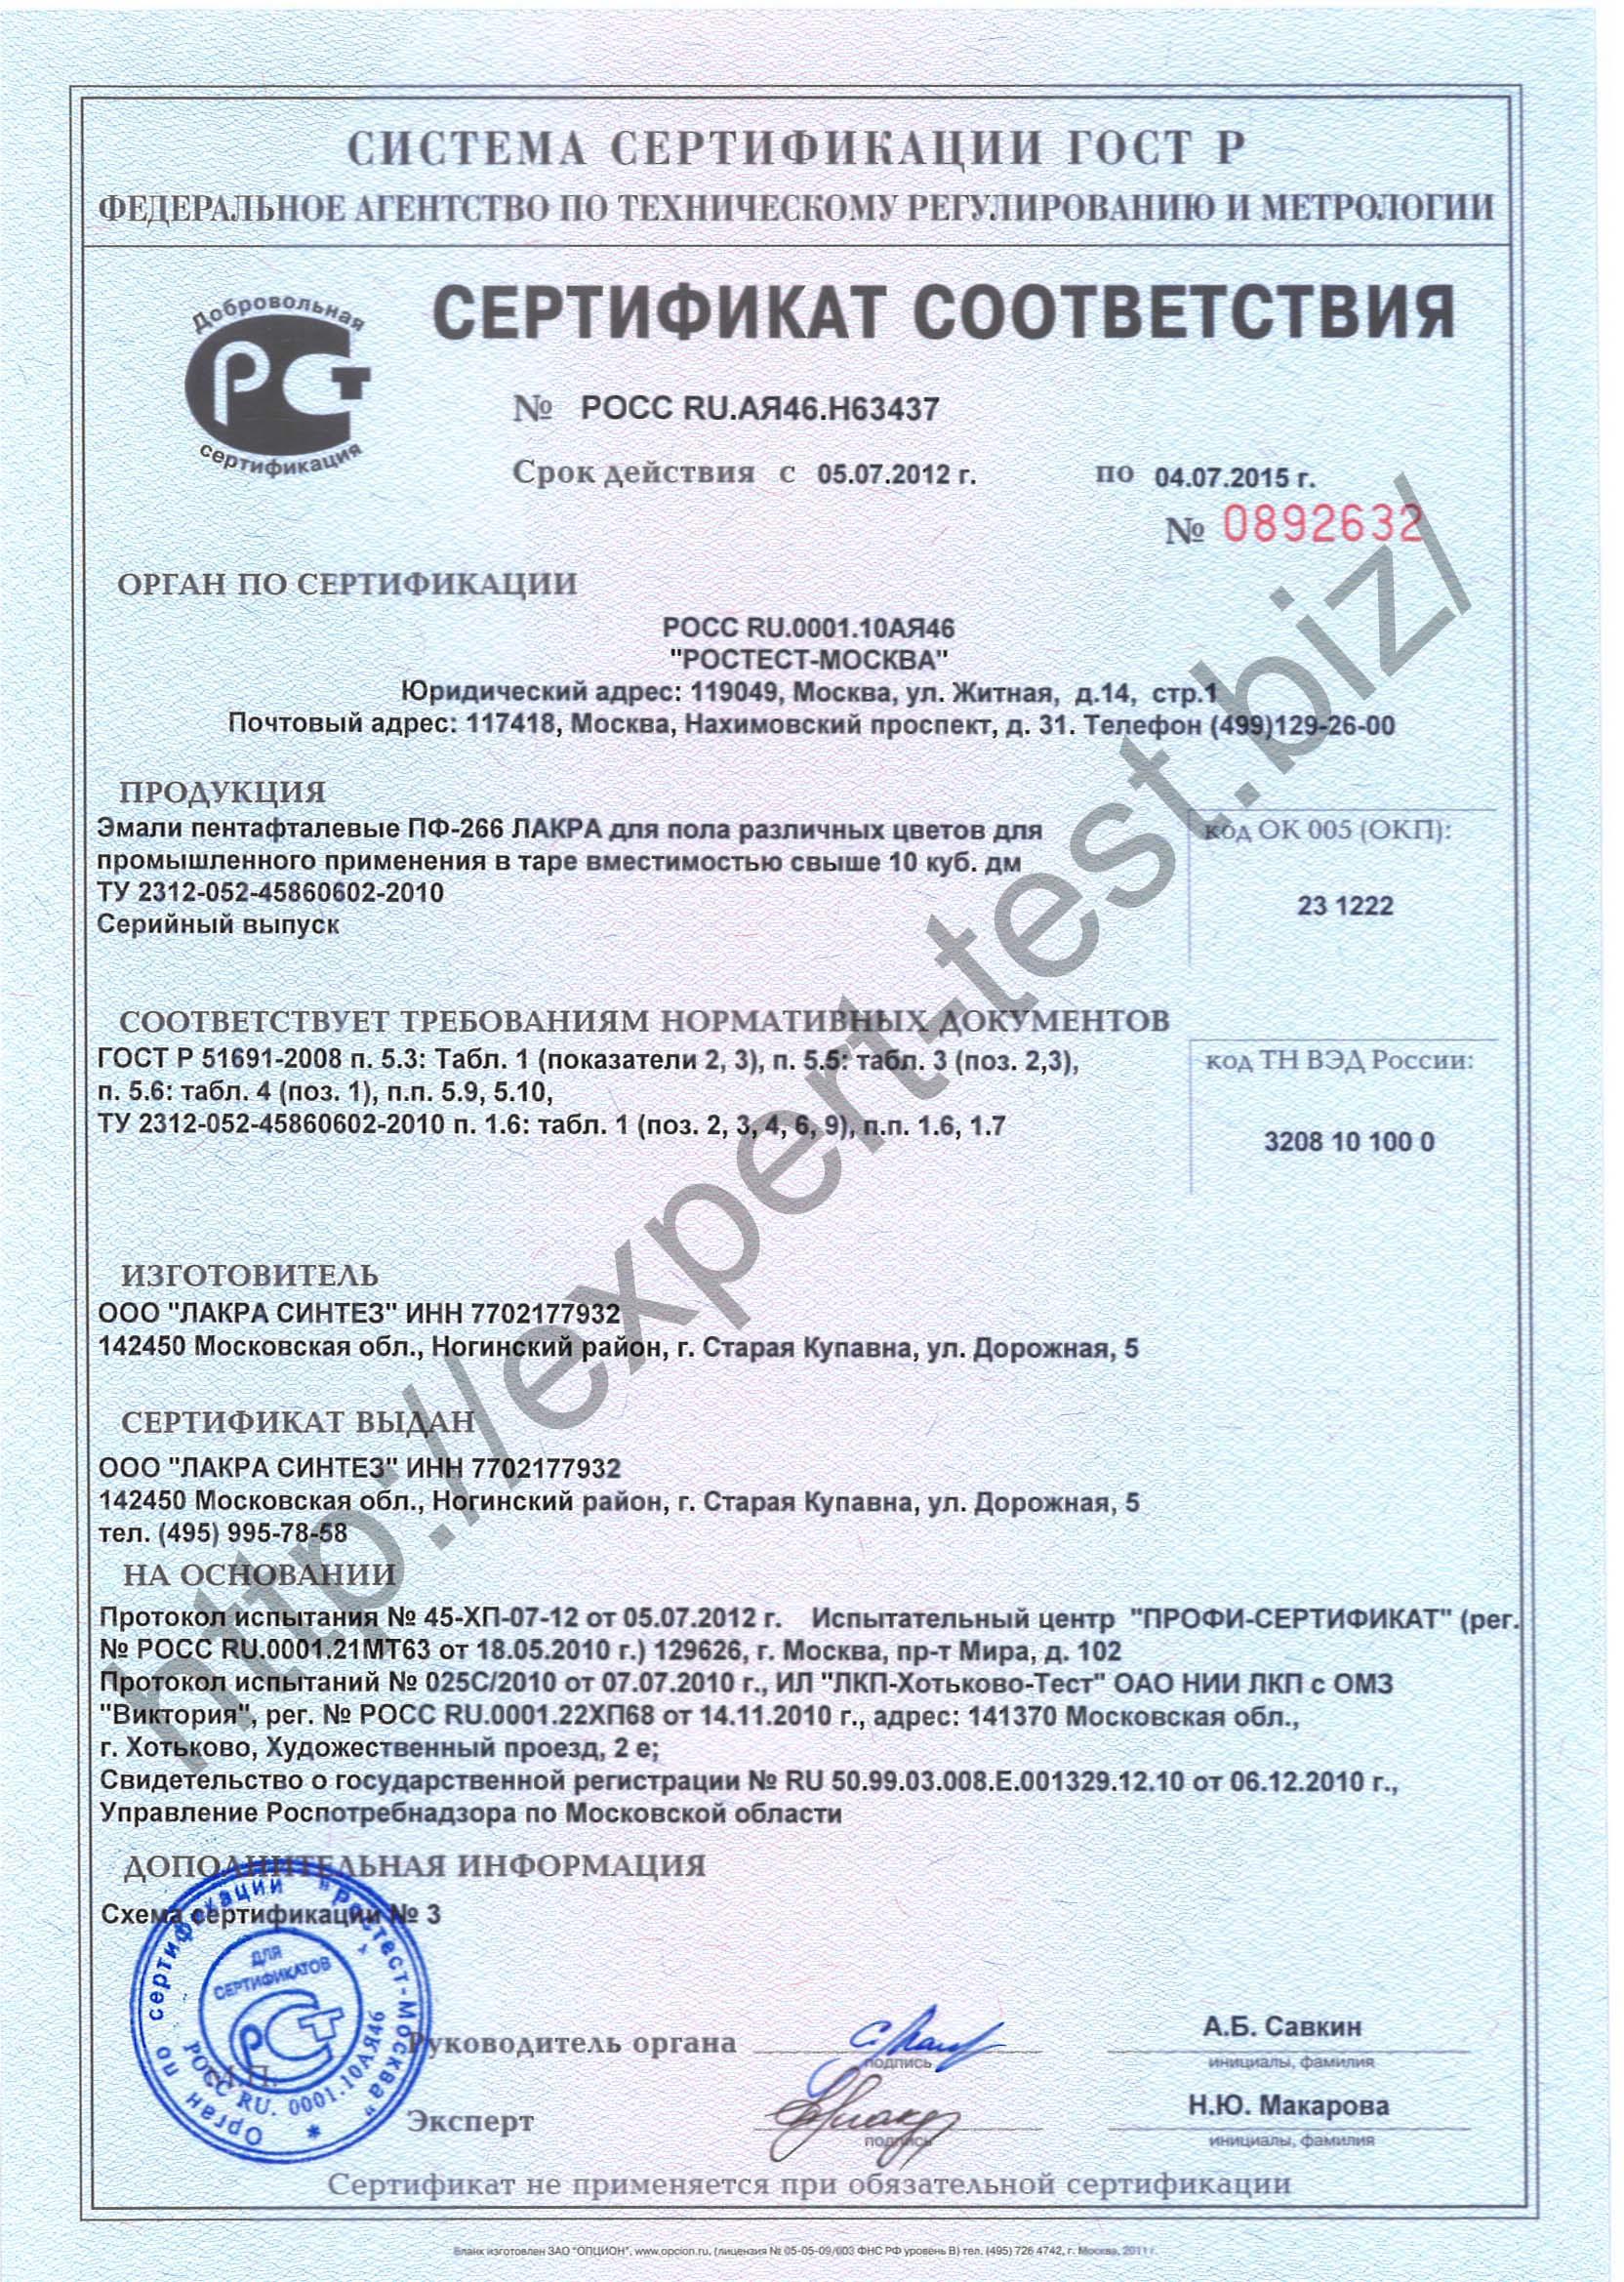 Сертификация материалов стоимость сертификация хассп исо 22000 преимущества